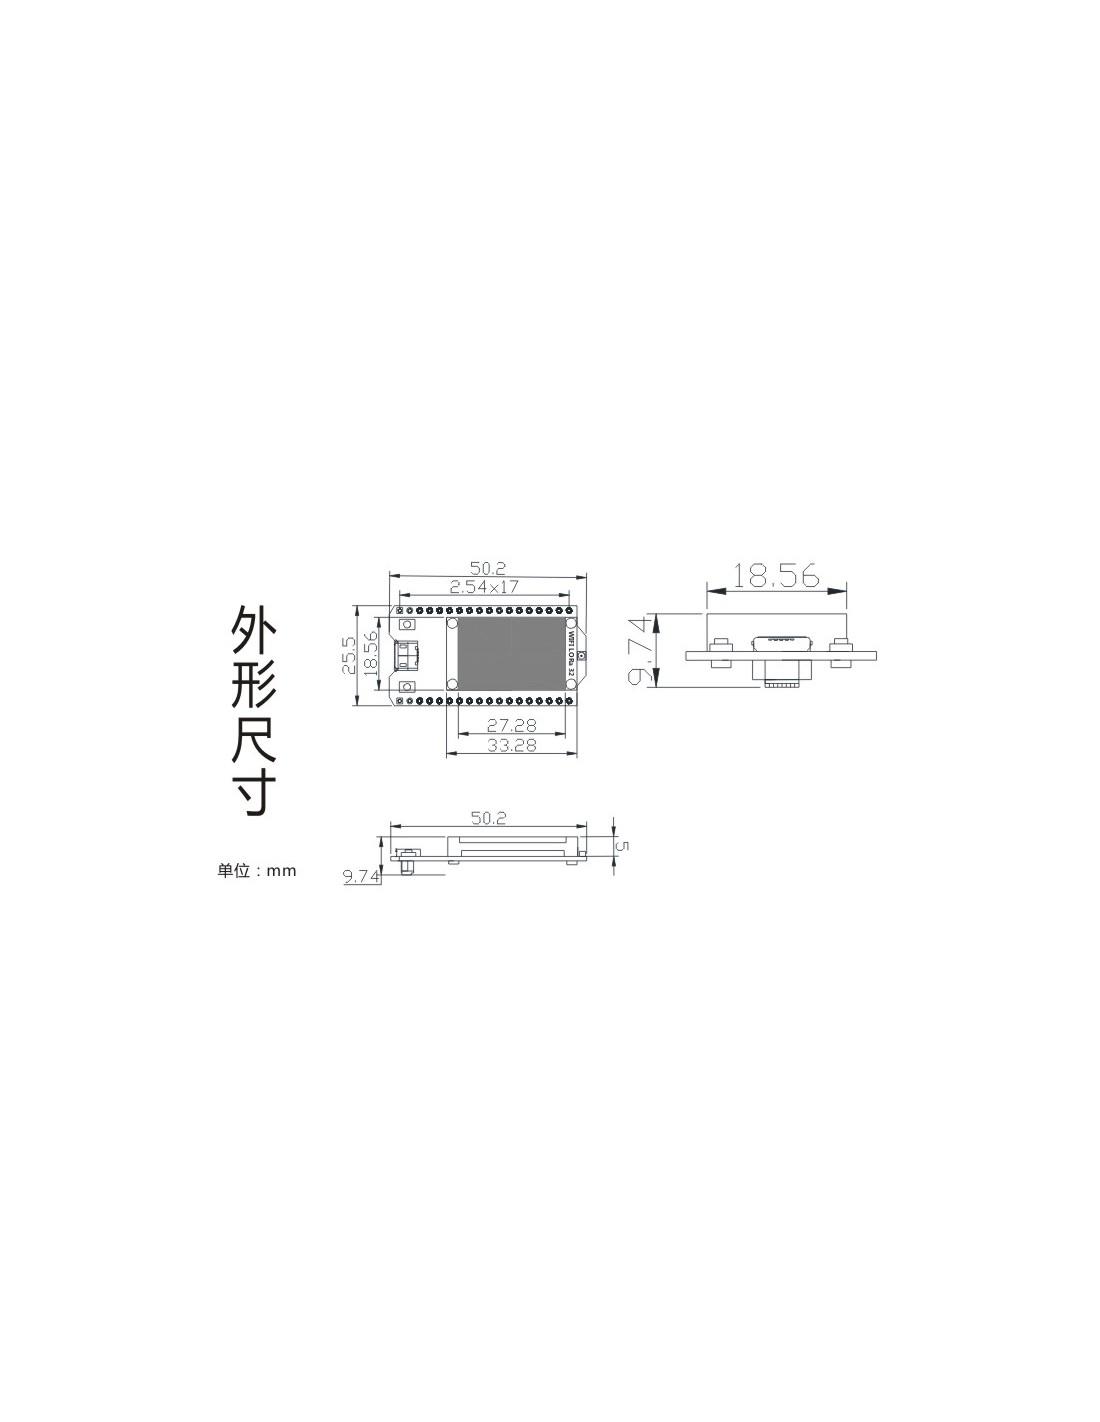 Wifi Lora 32 Dev  Board (ESP32, OLED, Lora 433Mhz, Wifi